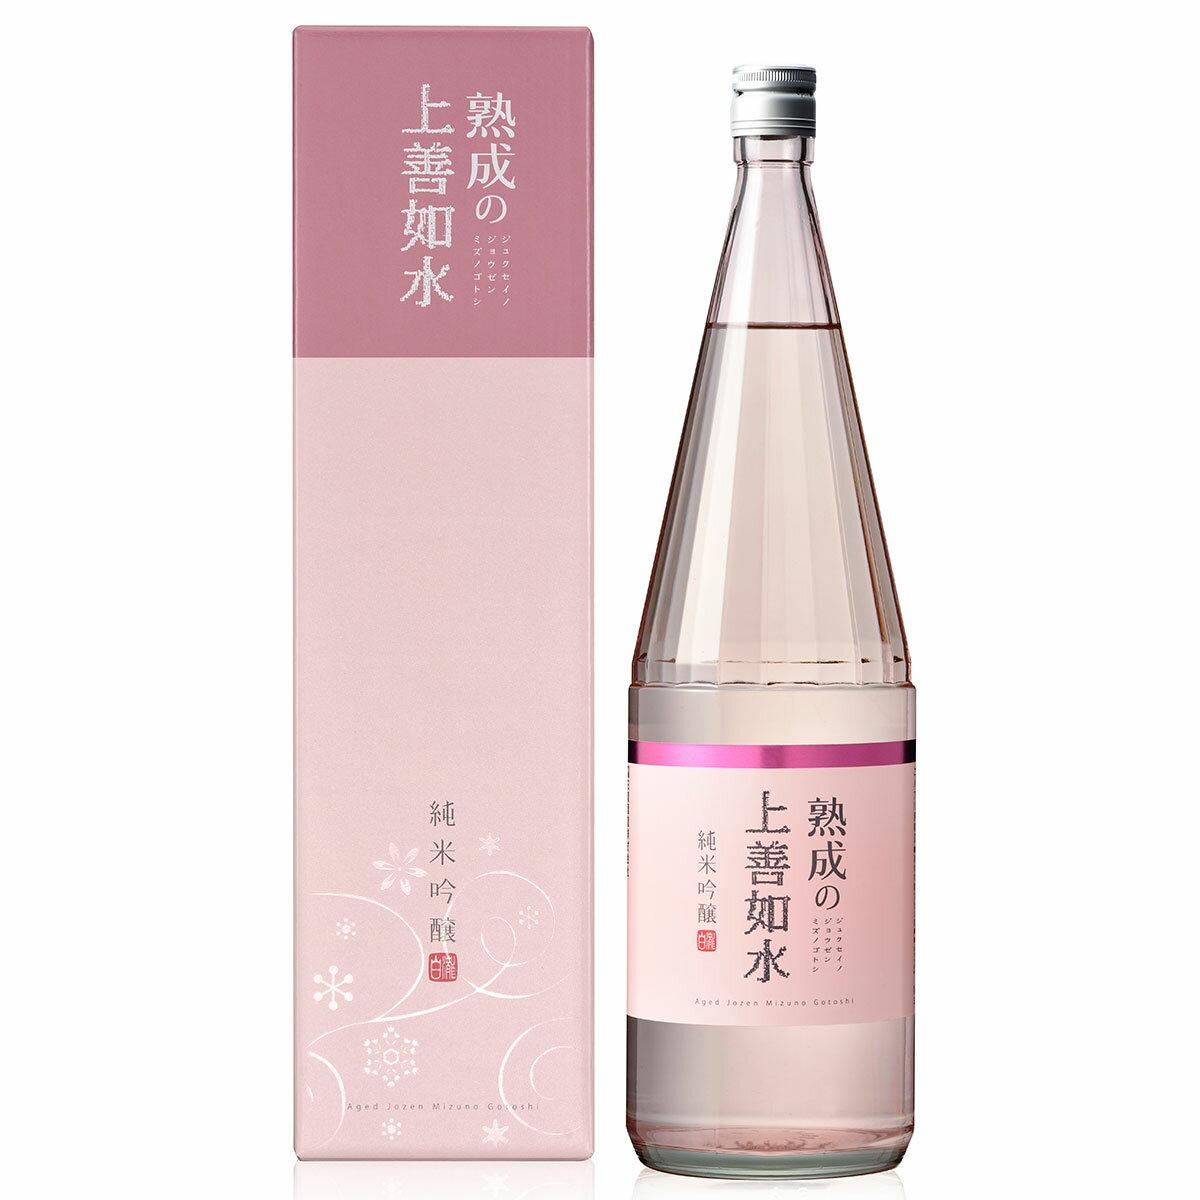 白瀧酒造 熟成の上善如水 純米吟醸 1800ml 日本酒 ギフト 新潟